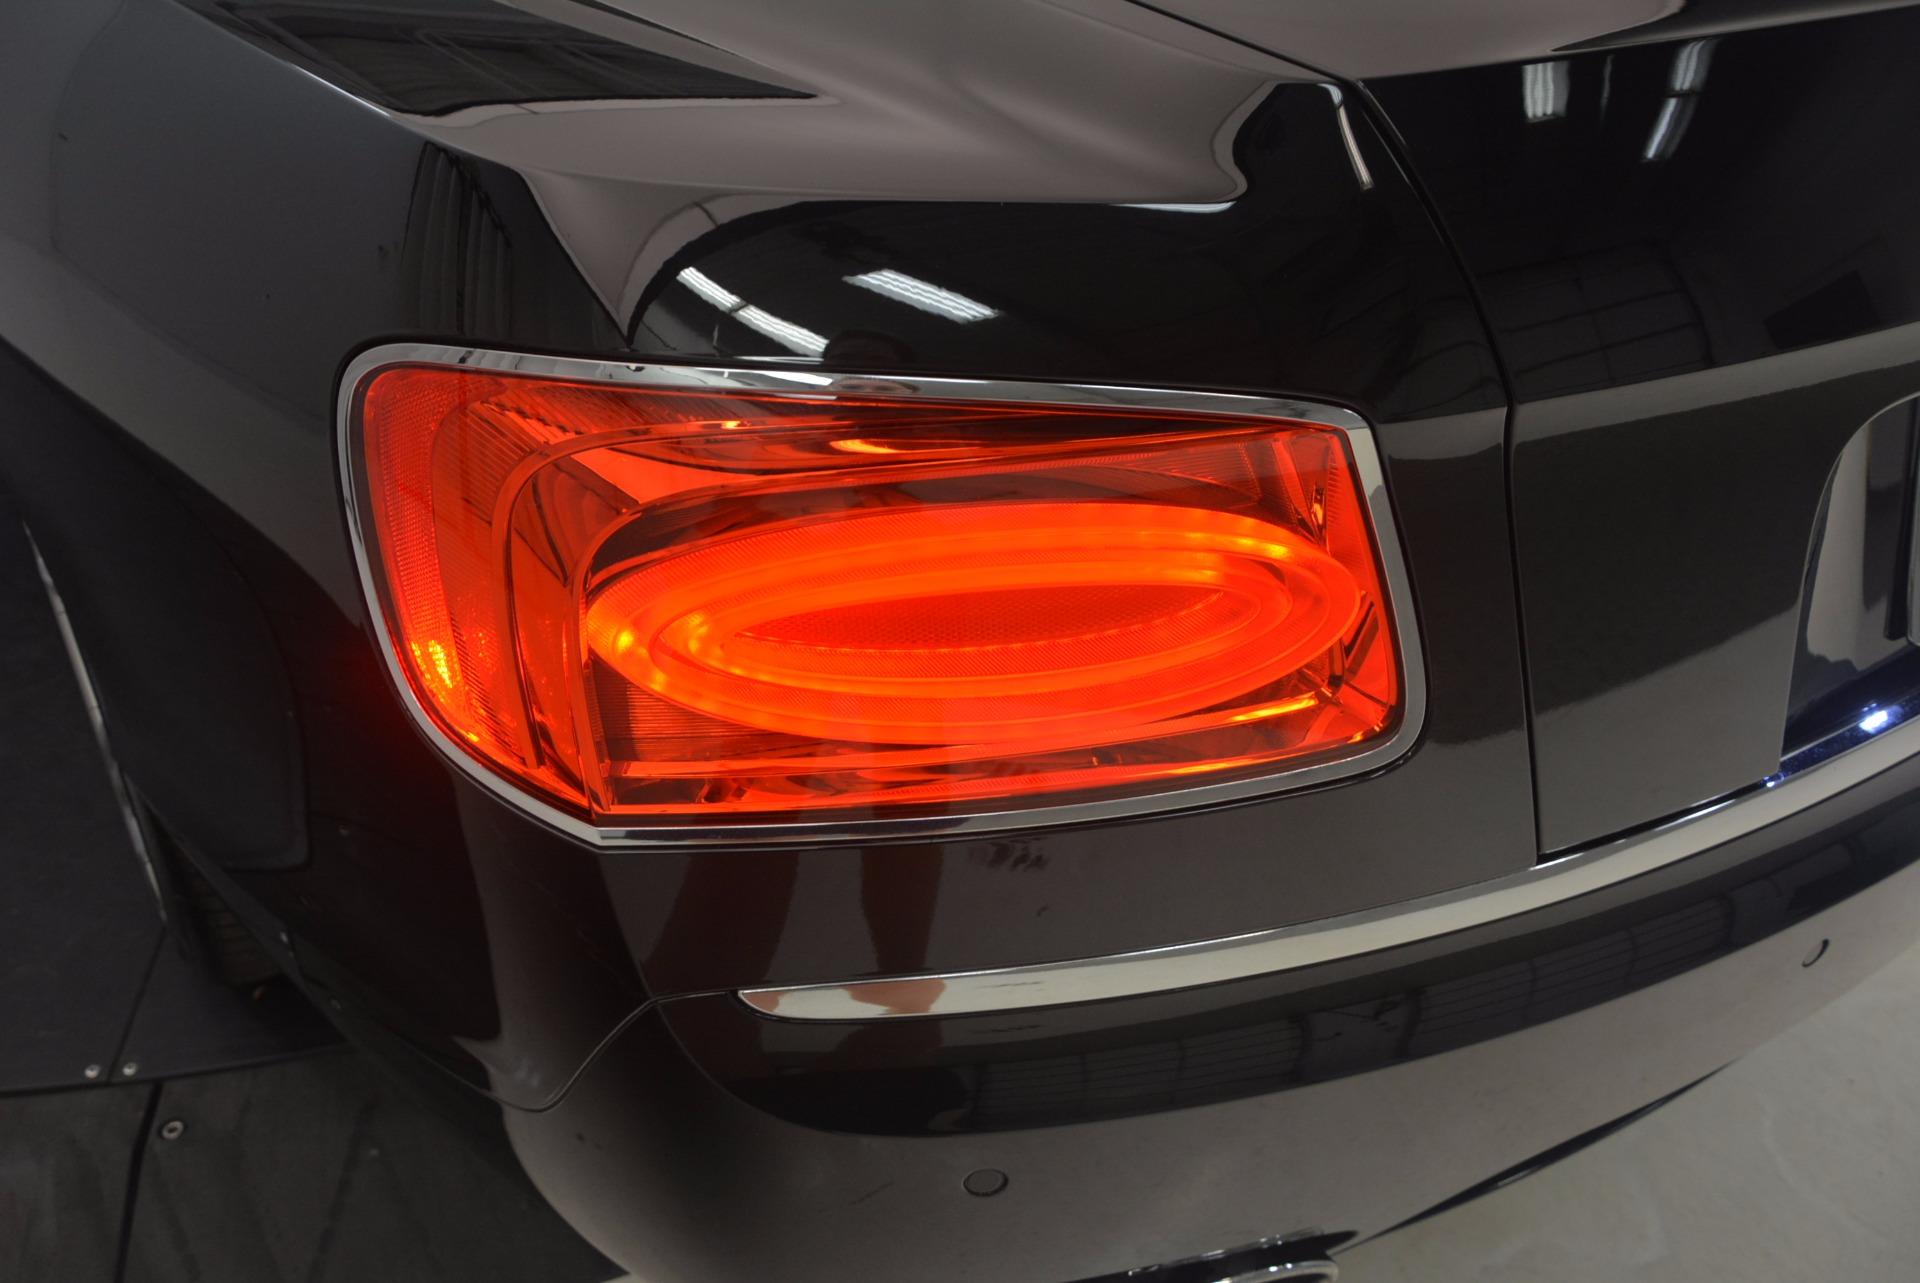 Used 2015 Bentley Flying Spur V8 For Sale In Westport, CT 1199_p40